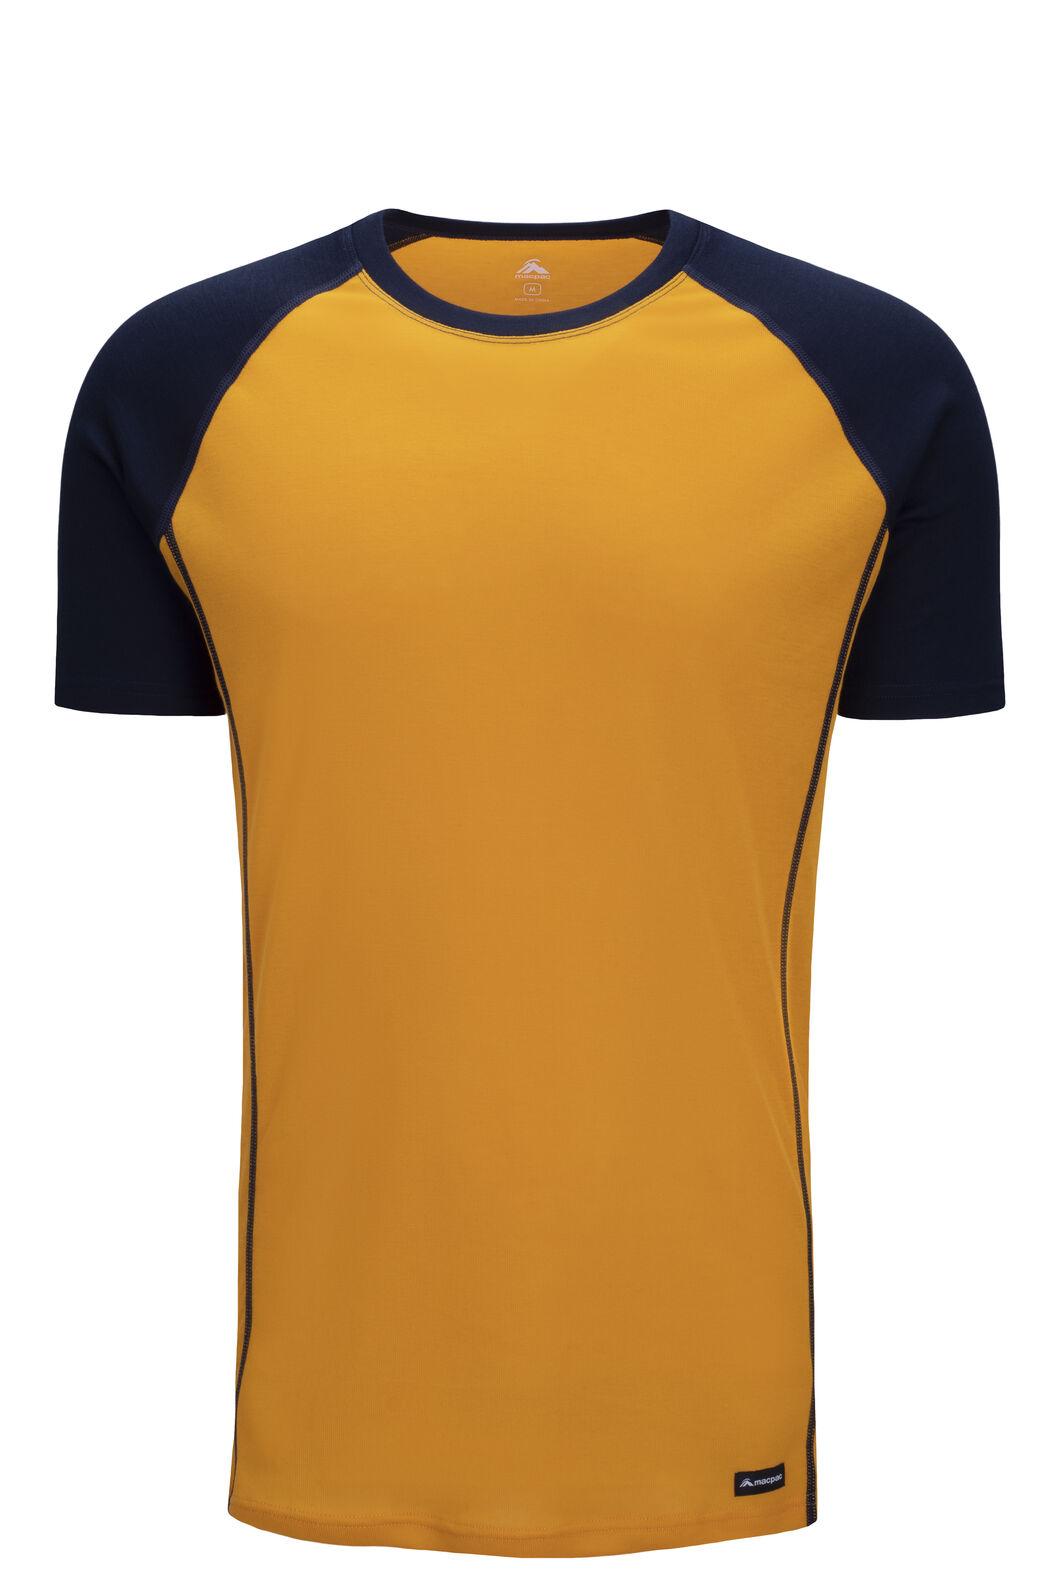 Macpac Geothermal Short Sleeve Tee — Men's, Cadmium Yellow/Total Eclipse, hi-res